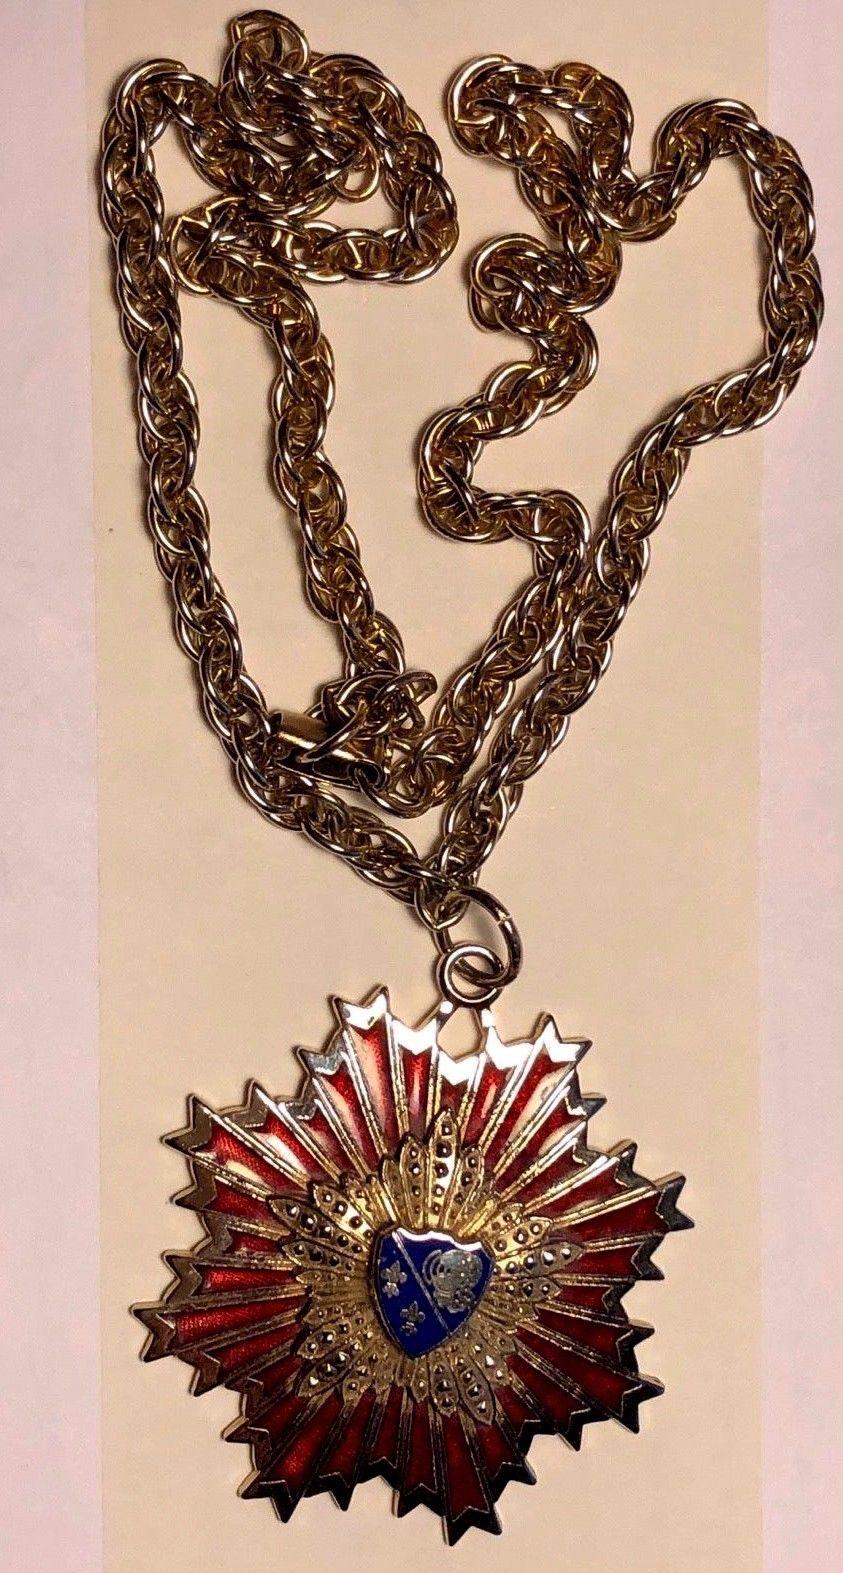 VTG silver color metal Enamel chain necklace code of arms star burst pendant